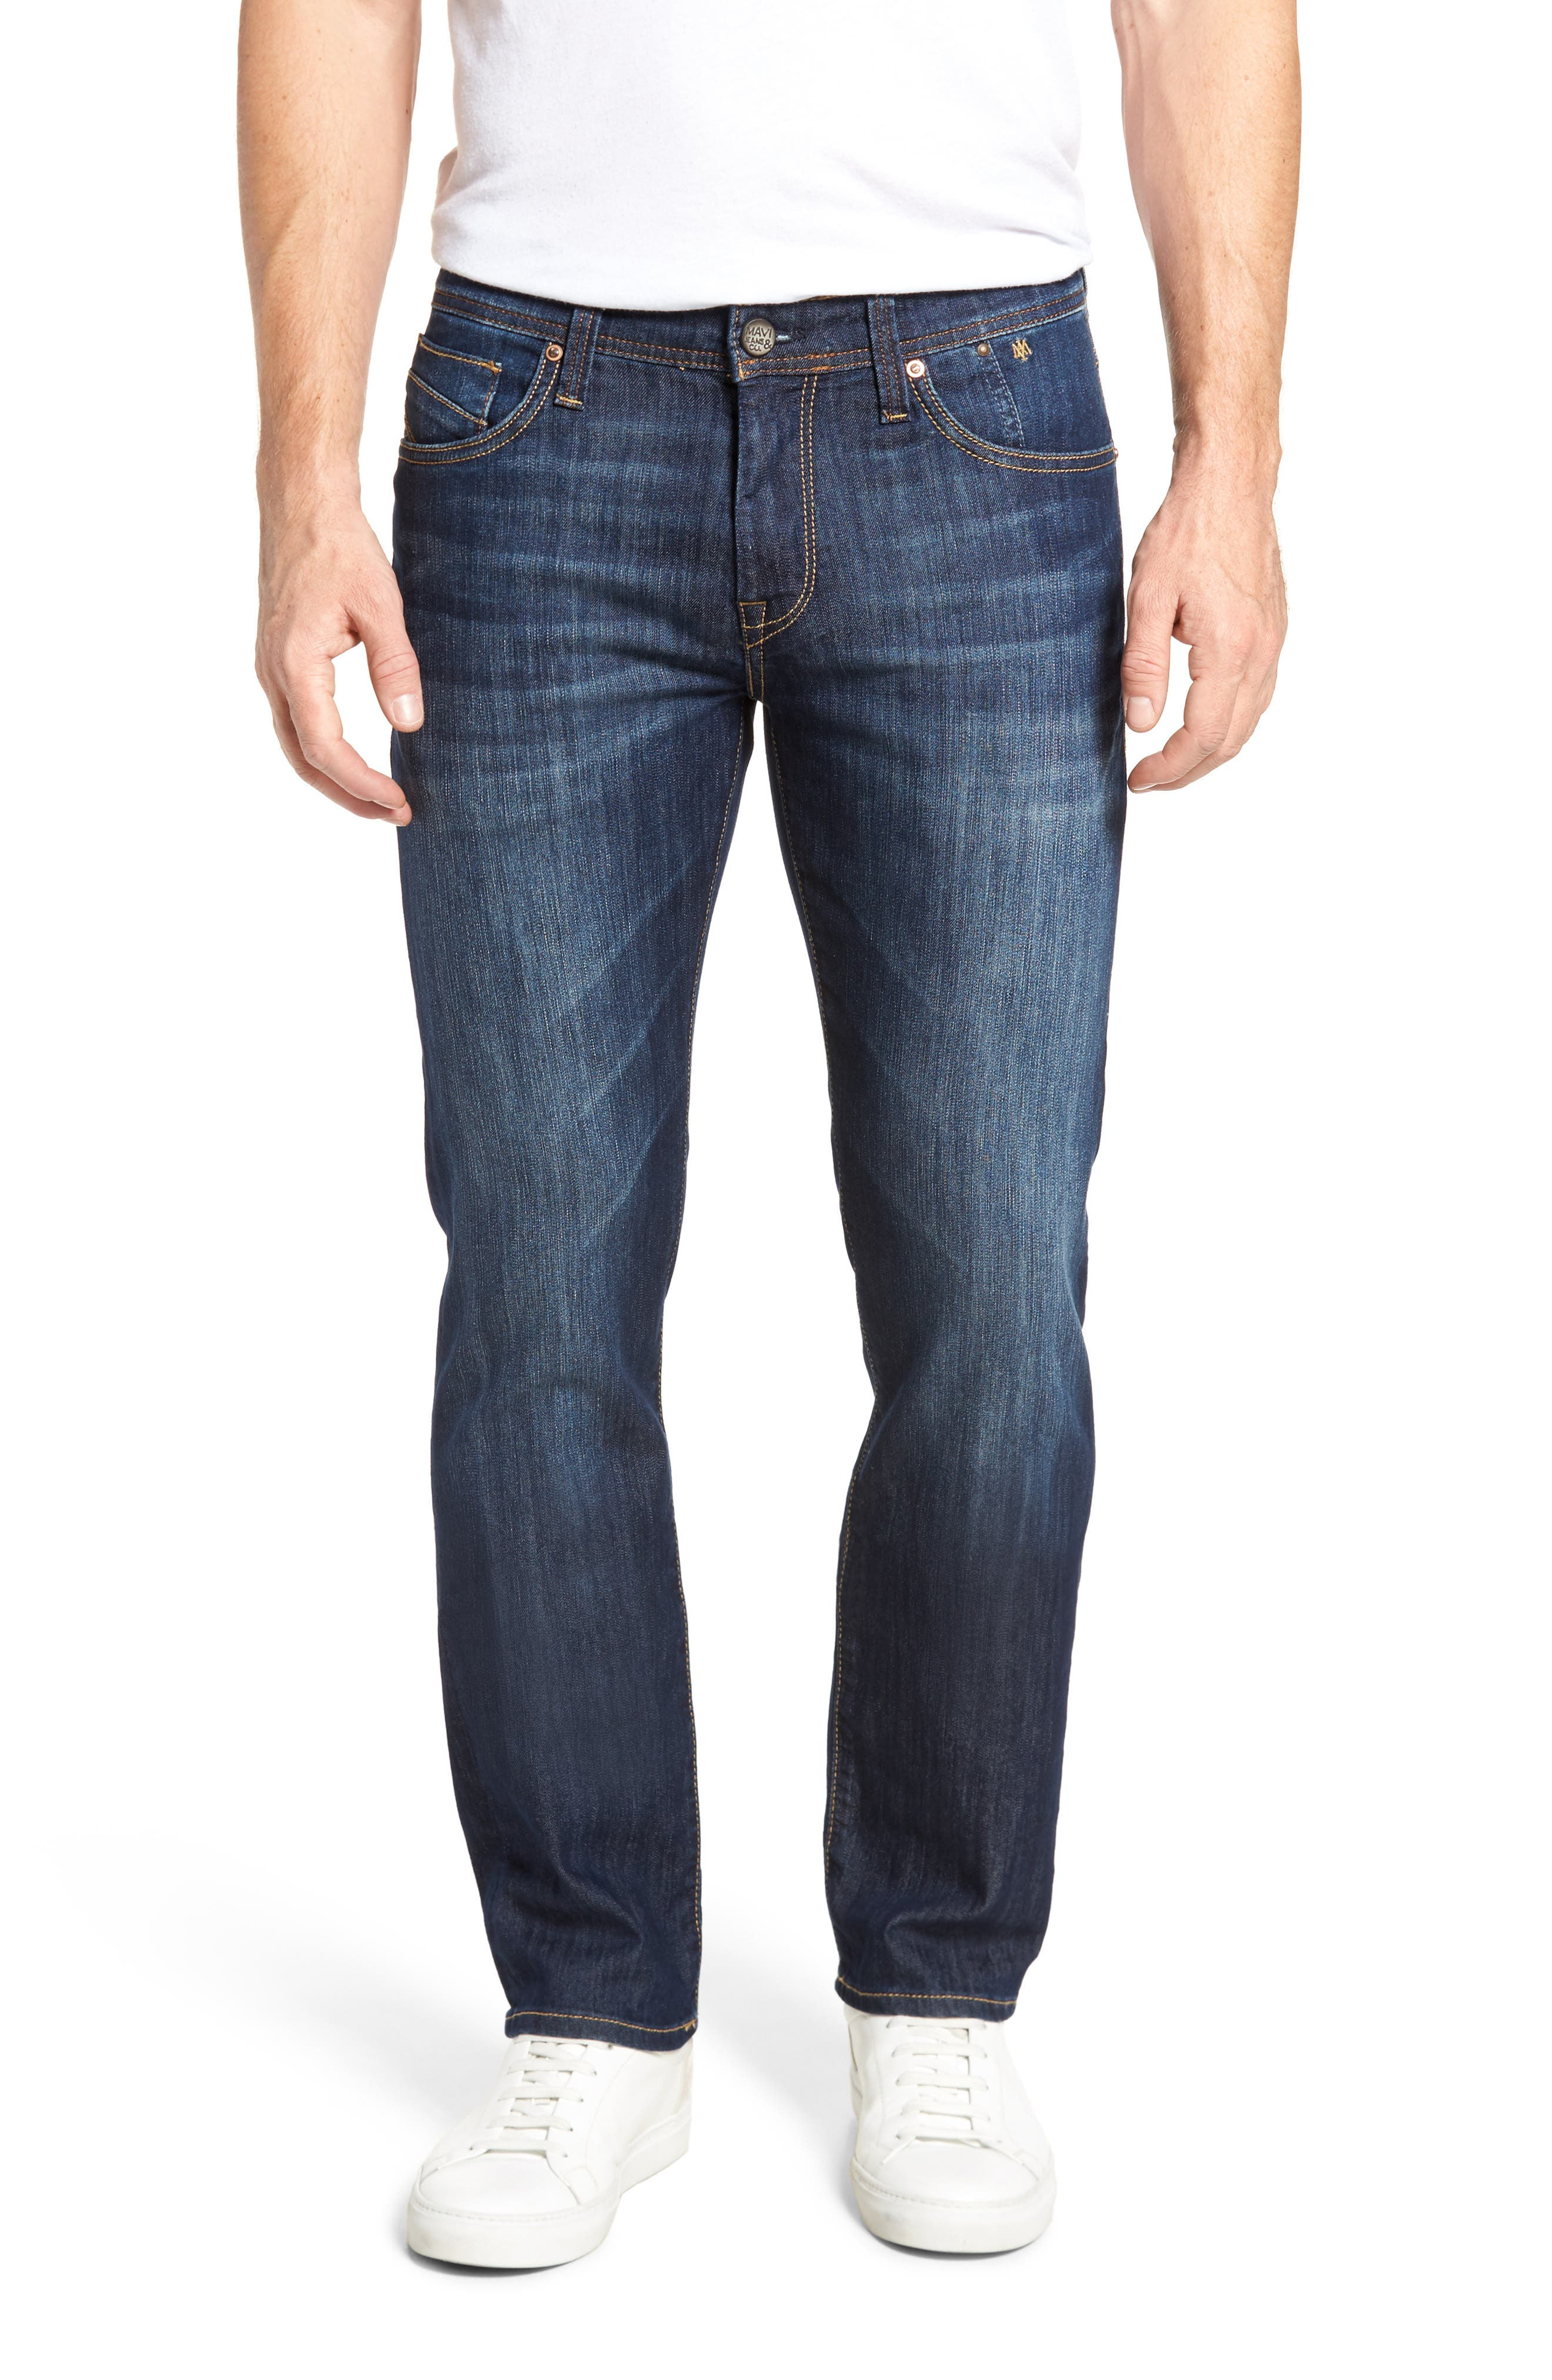 MAVI JEANS, Zach Straight Leg Jeans, Main thumbnail 1, color, DARK MAUI